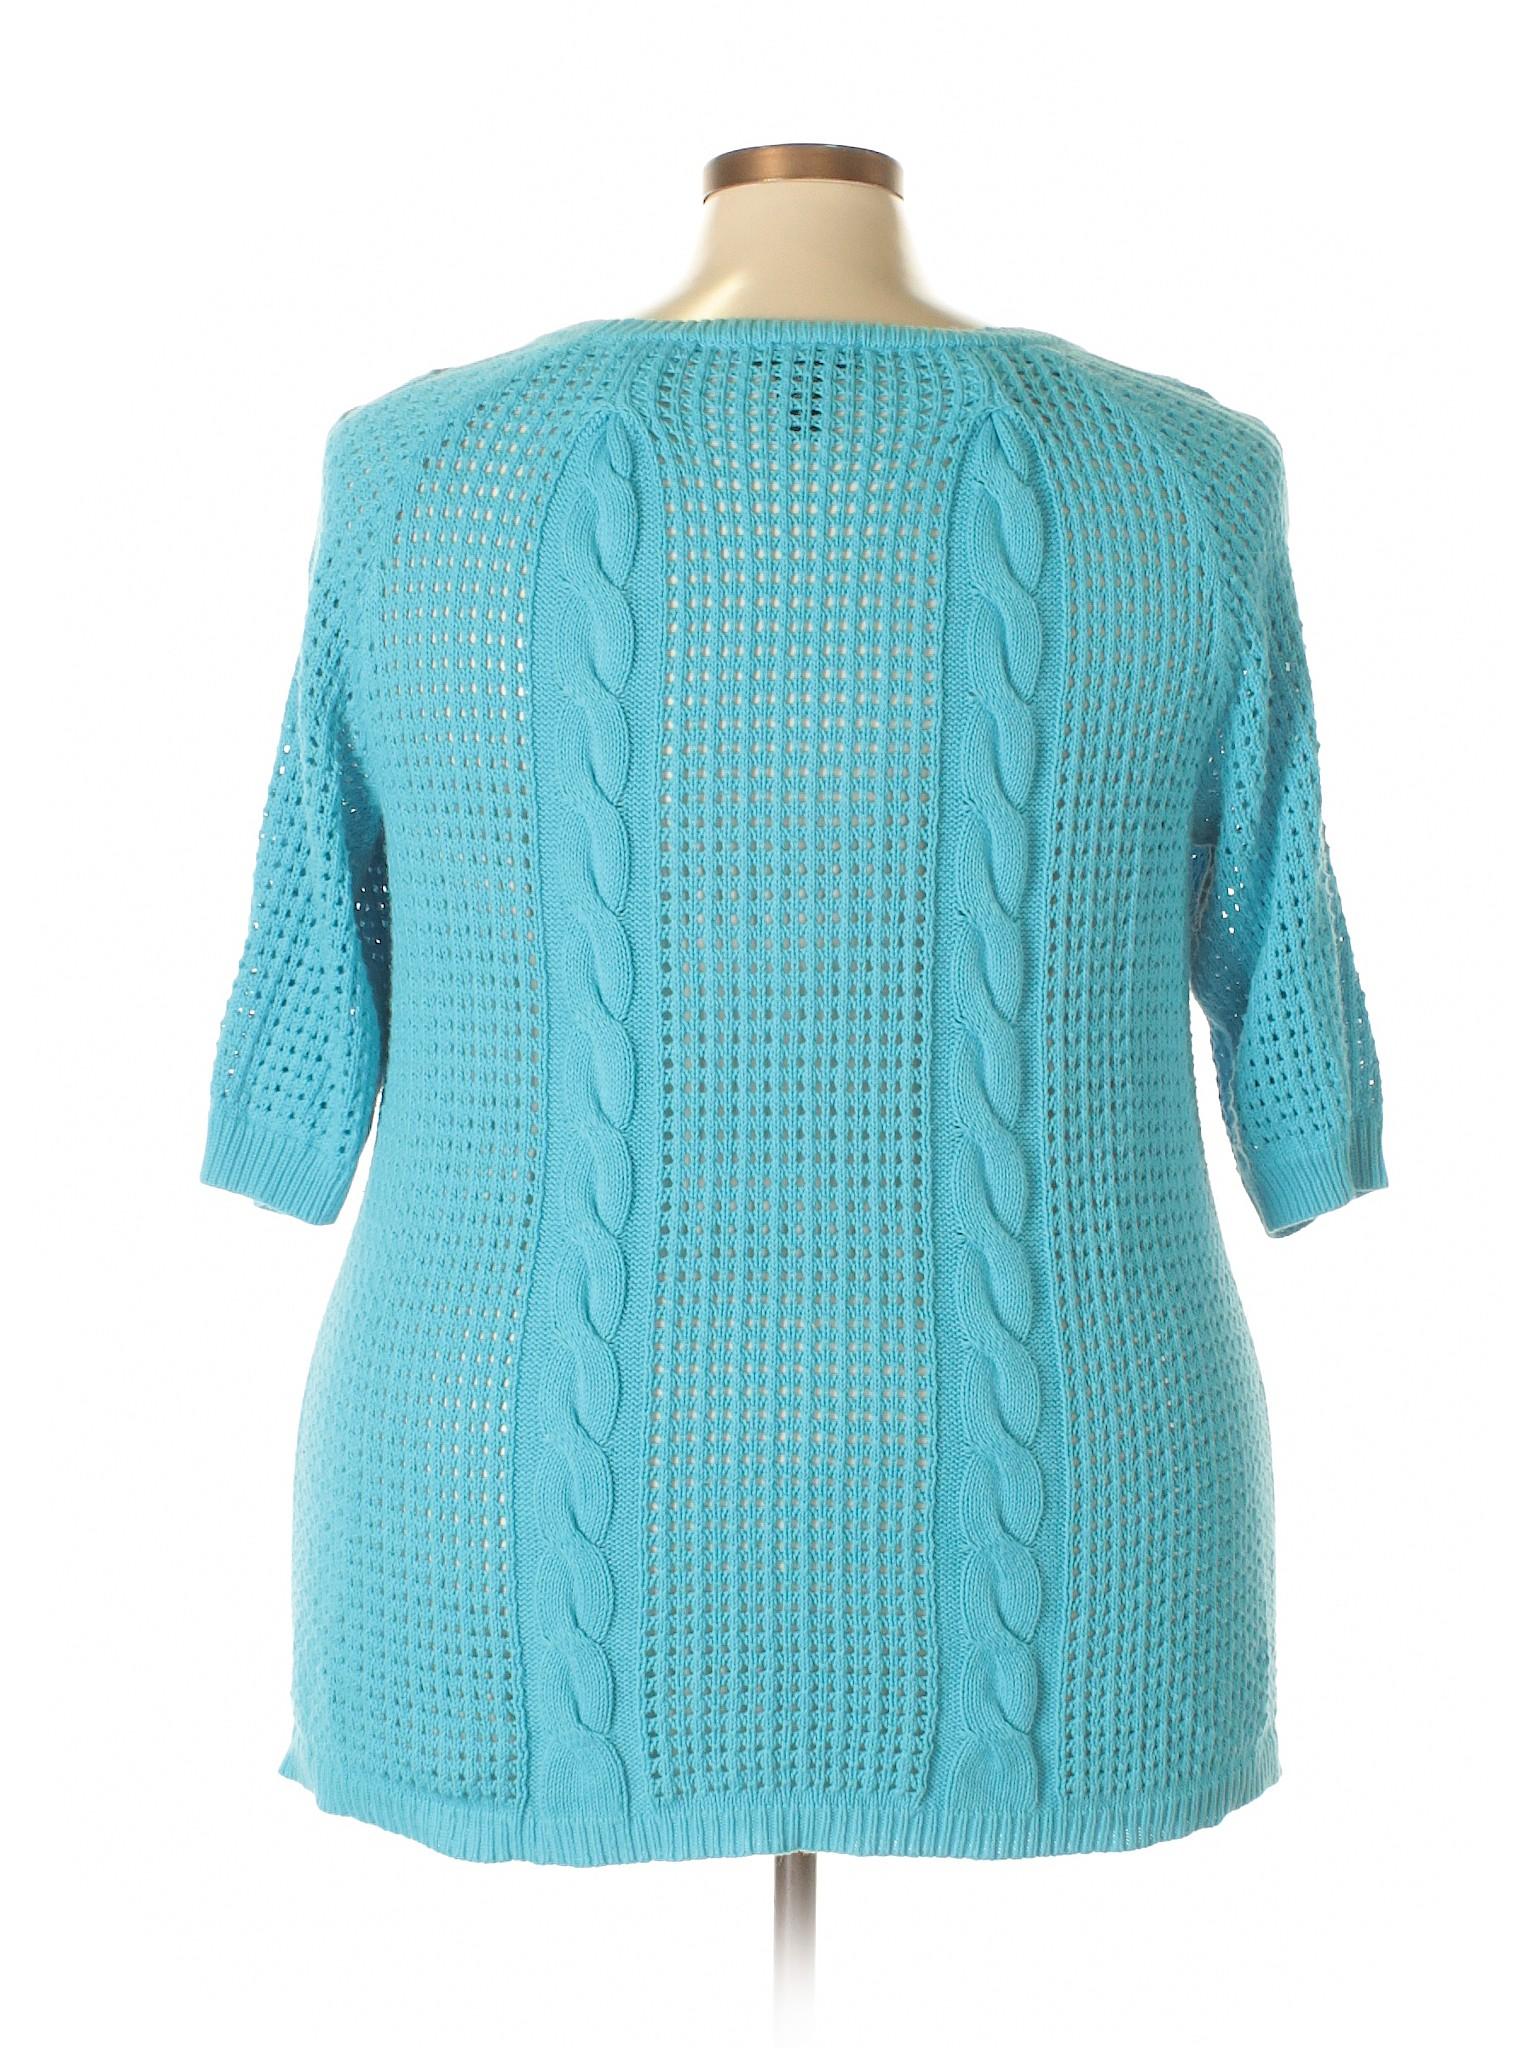 Pullover Sweater Lane Boutique Lane Boutique Bryant ZwqnSp8PO